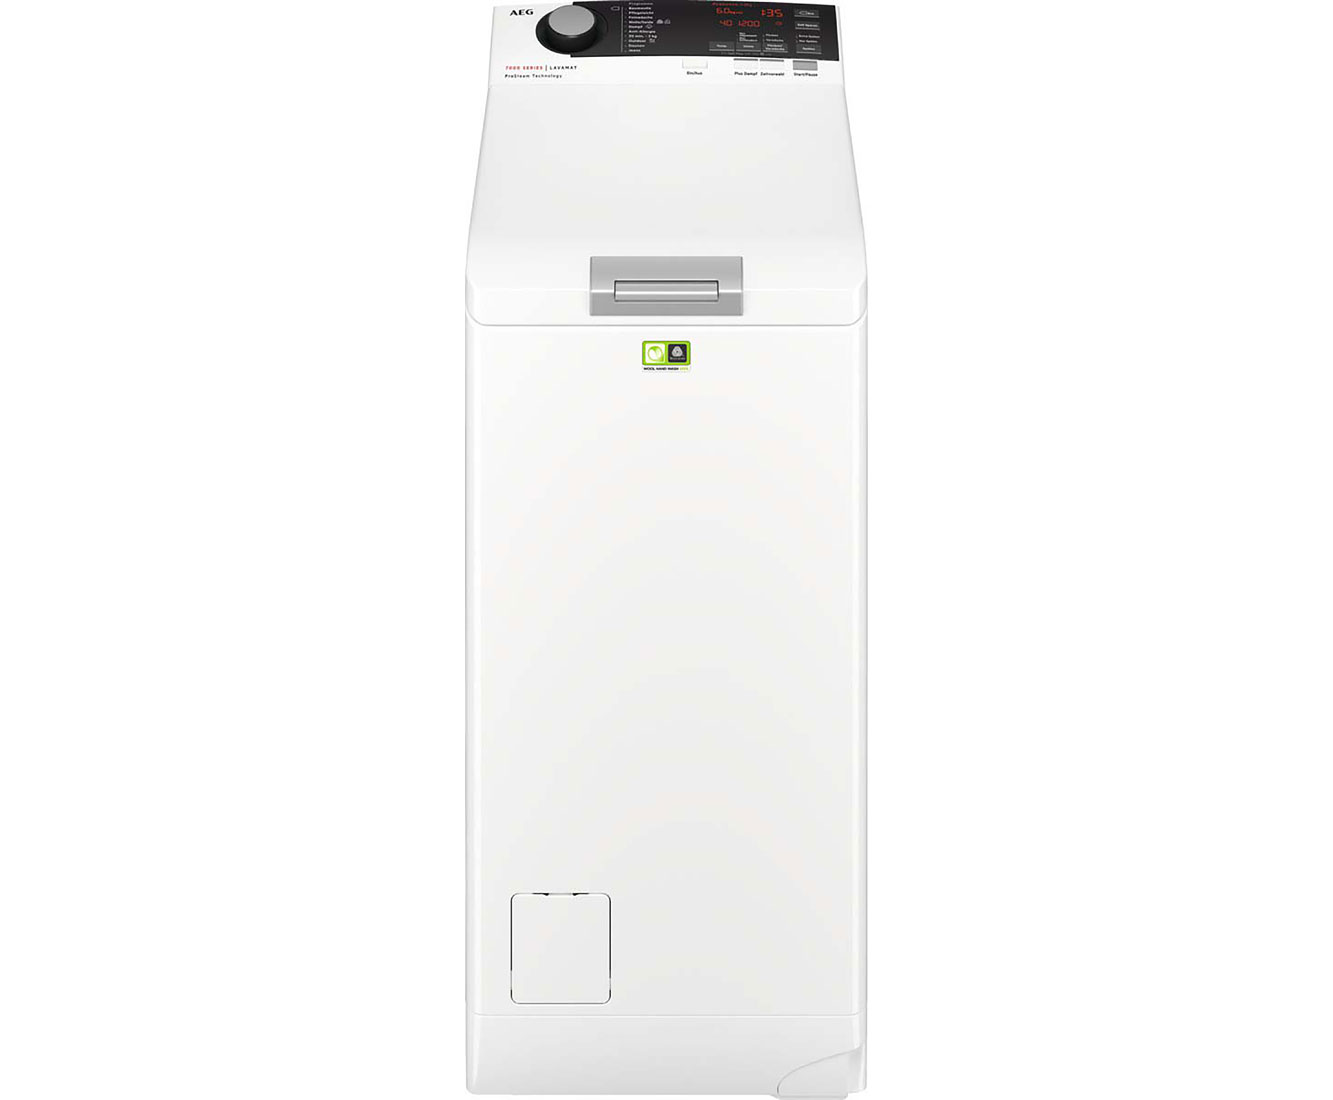 Aeg lavamat l7te74265 waschmaschine toplader 6 kg 1200 u min a